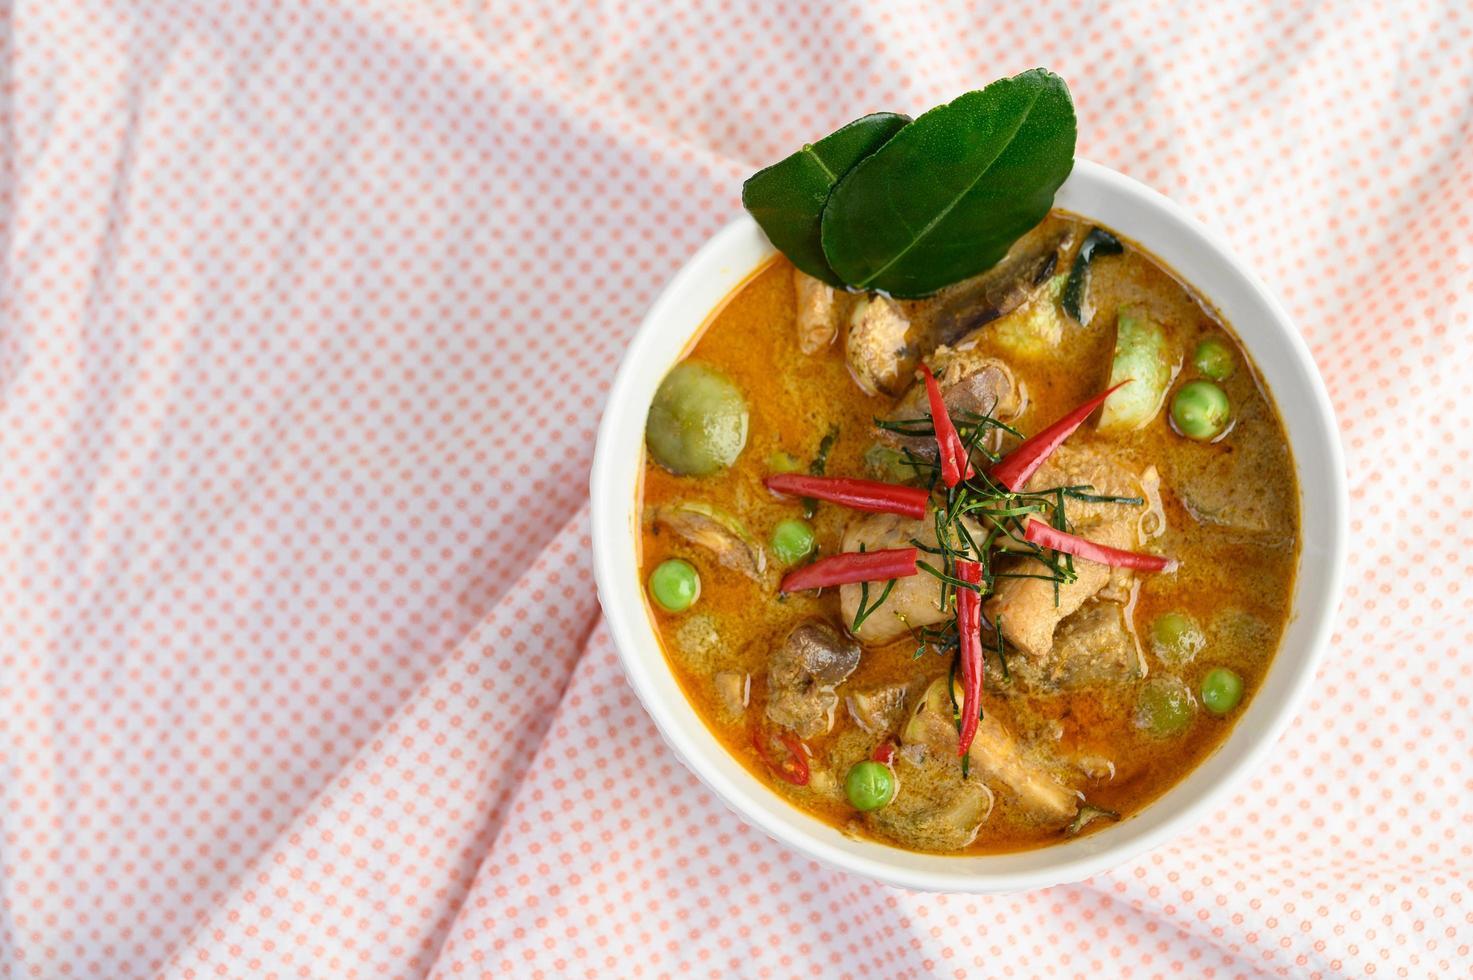 pikante kip gewokt met thaise aubergine foto